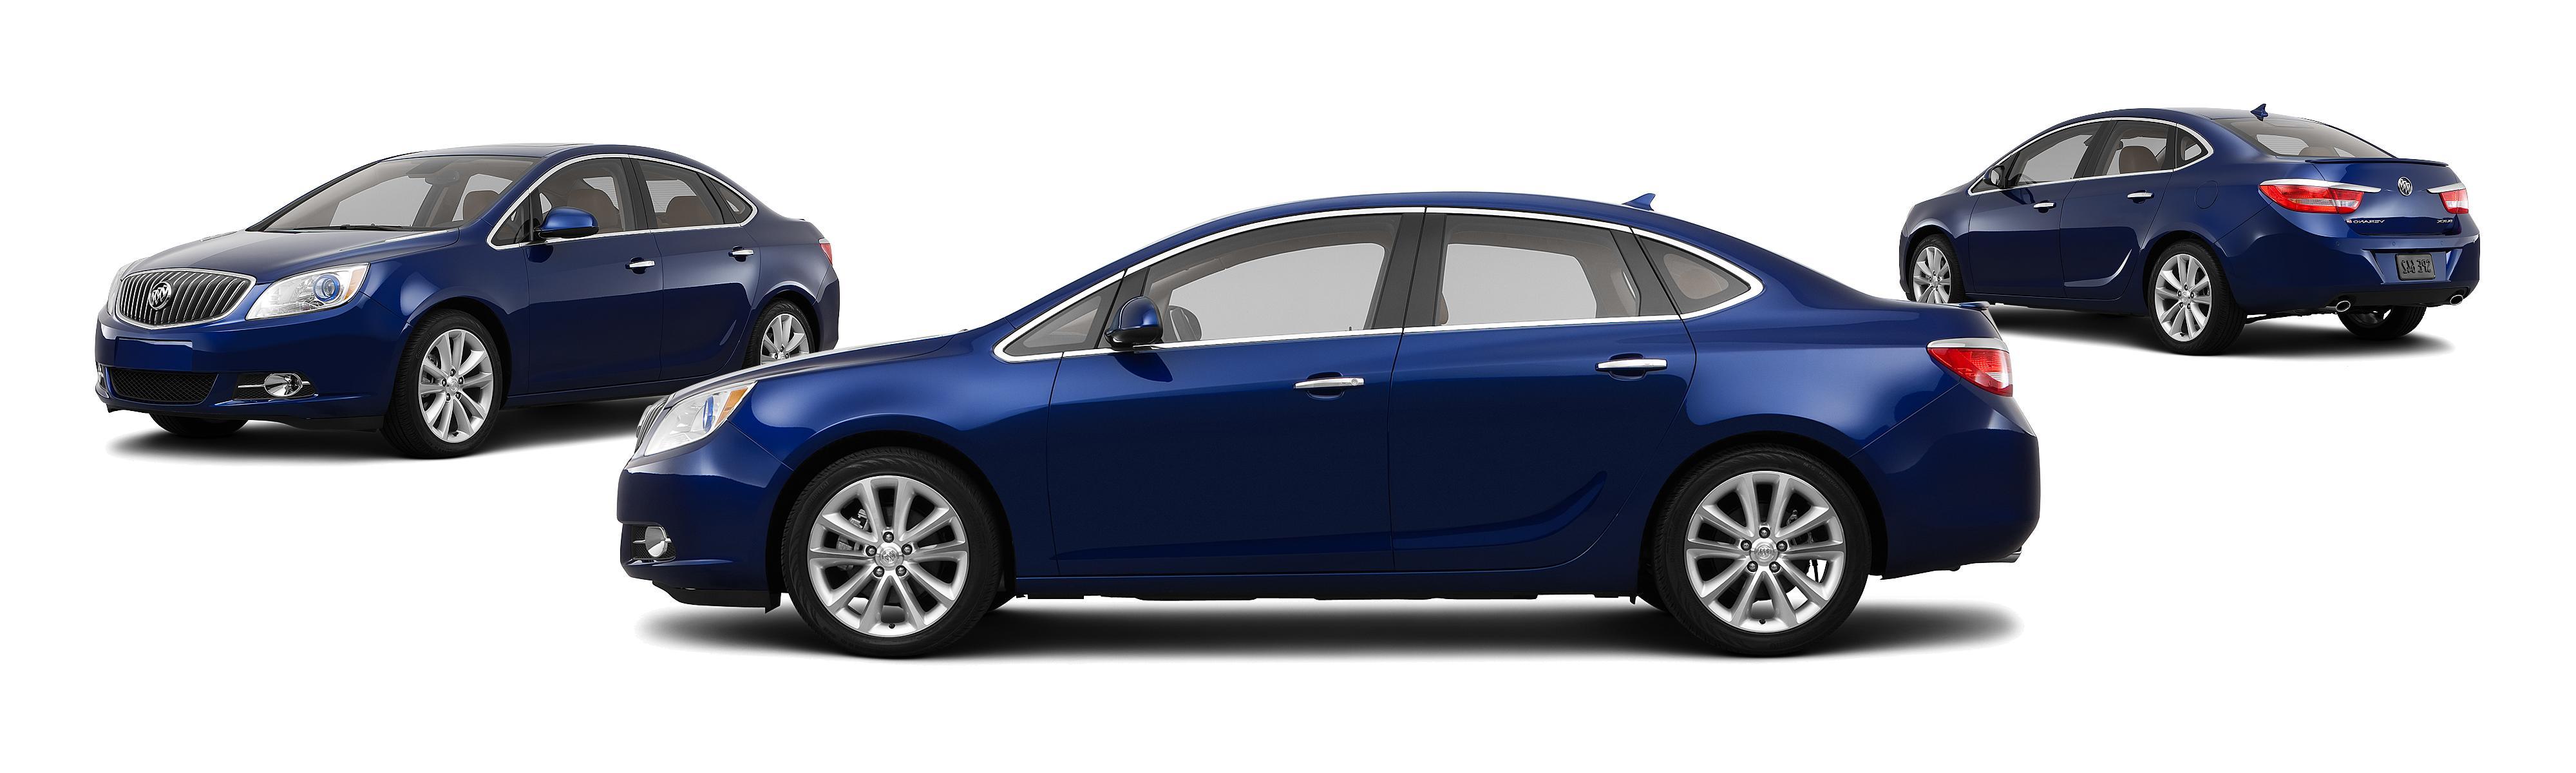 2013 Buick Verano Premium Group 4dr Sedan Research GrooveCar